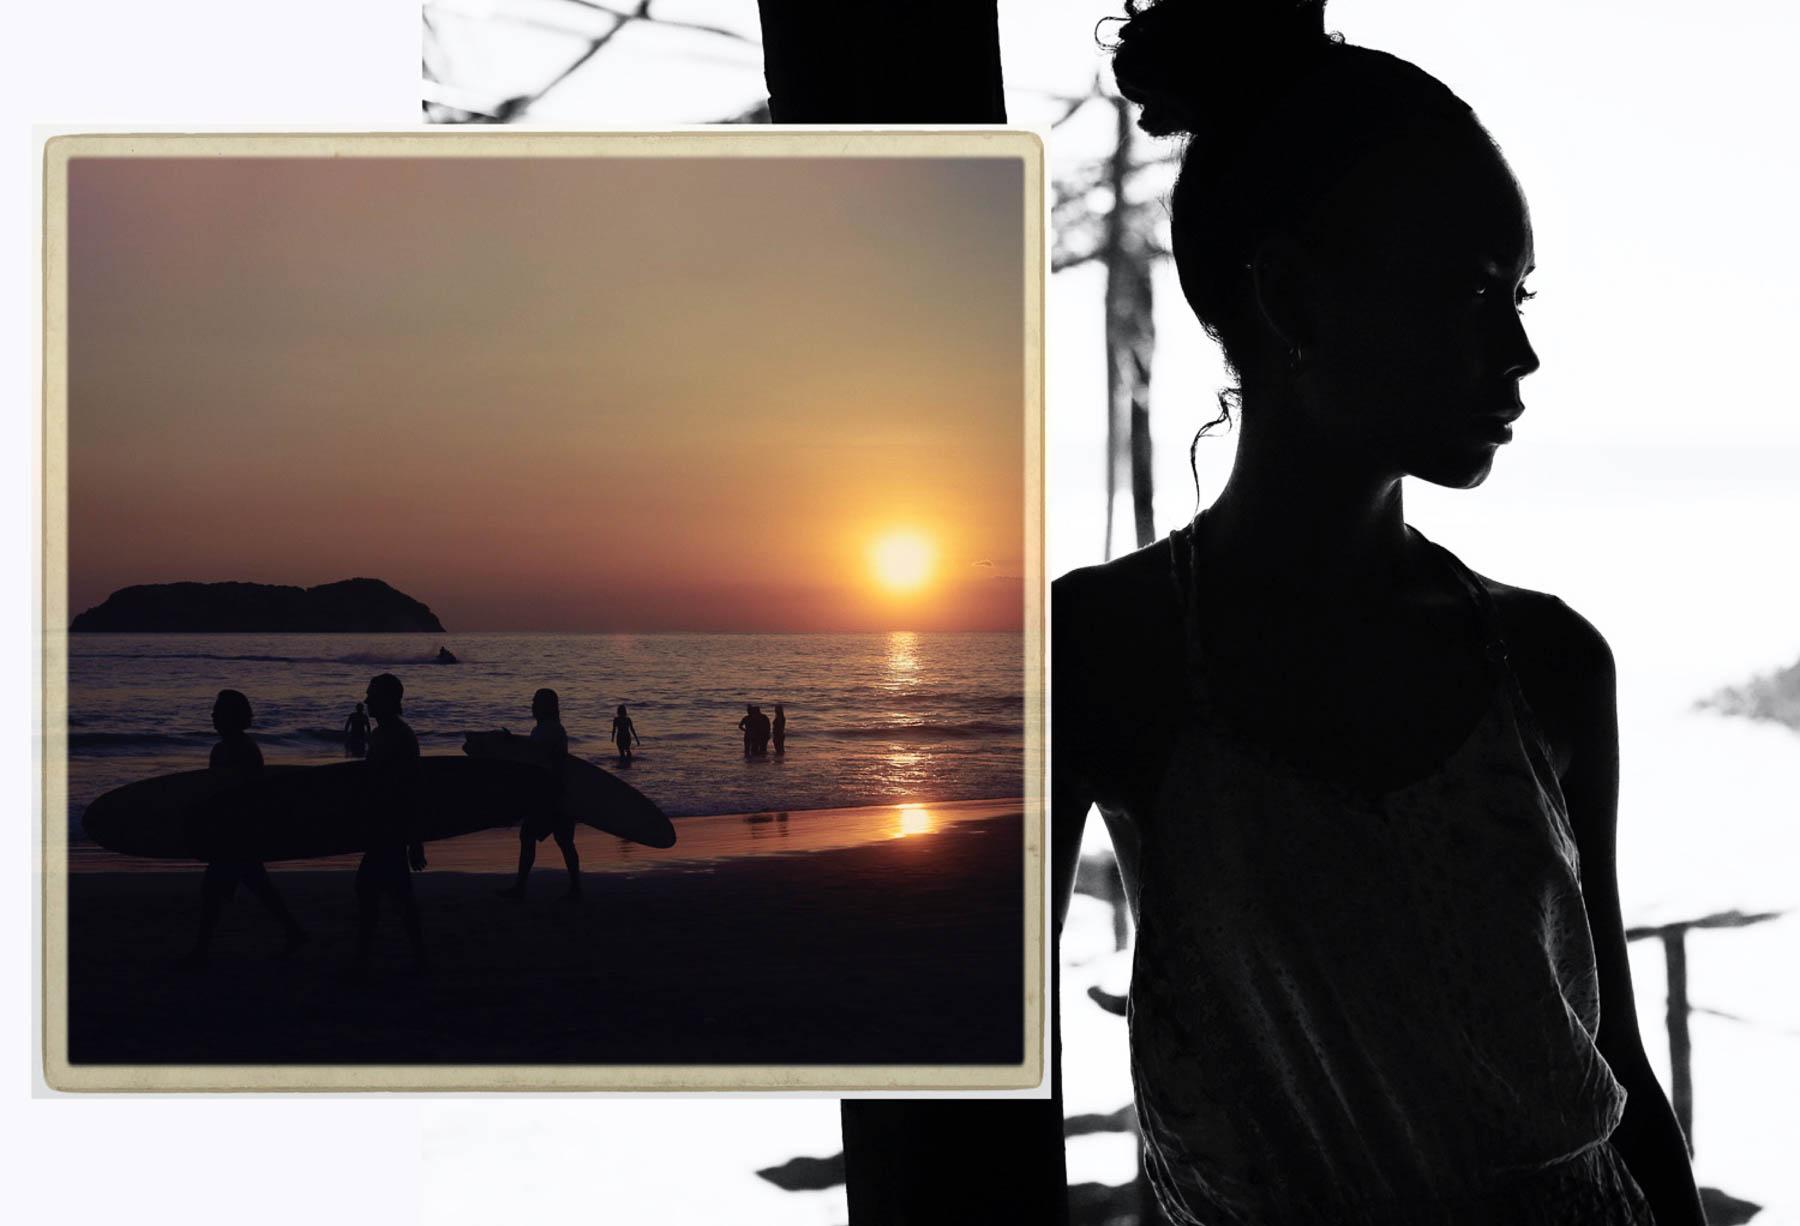 Backlighting - Silhouette